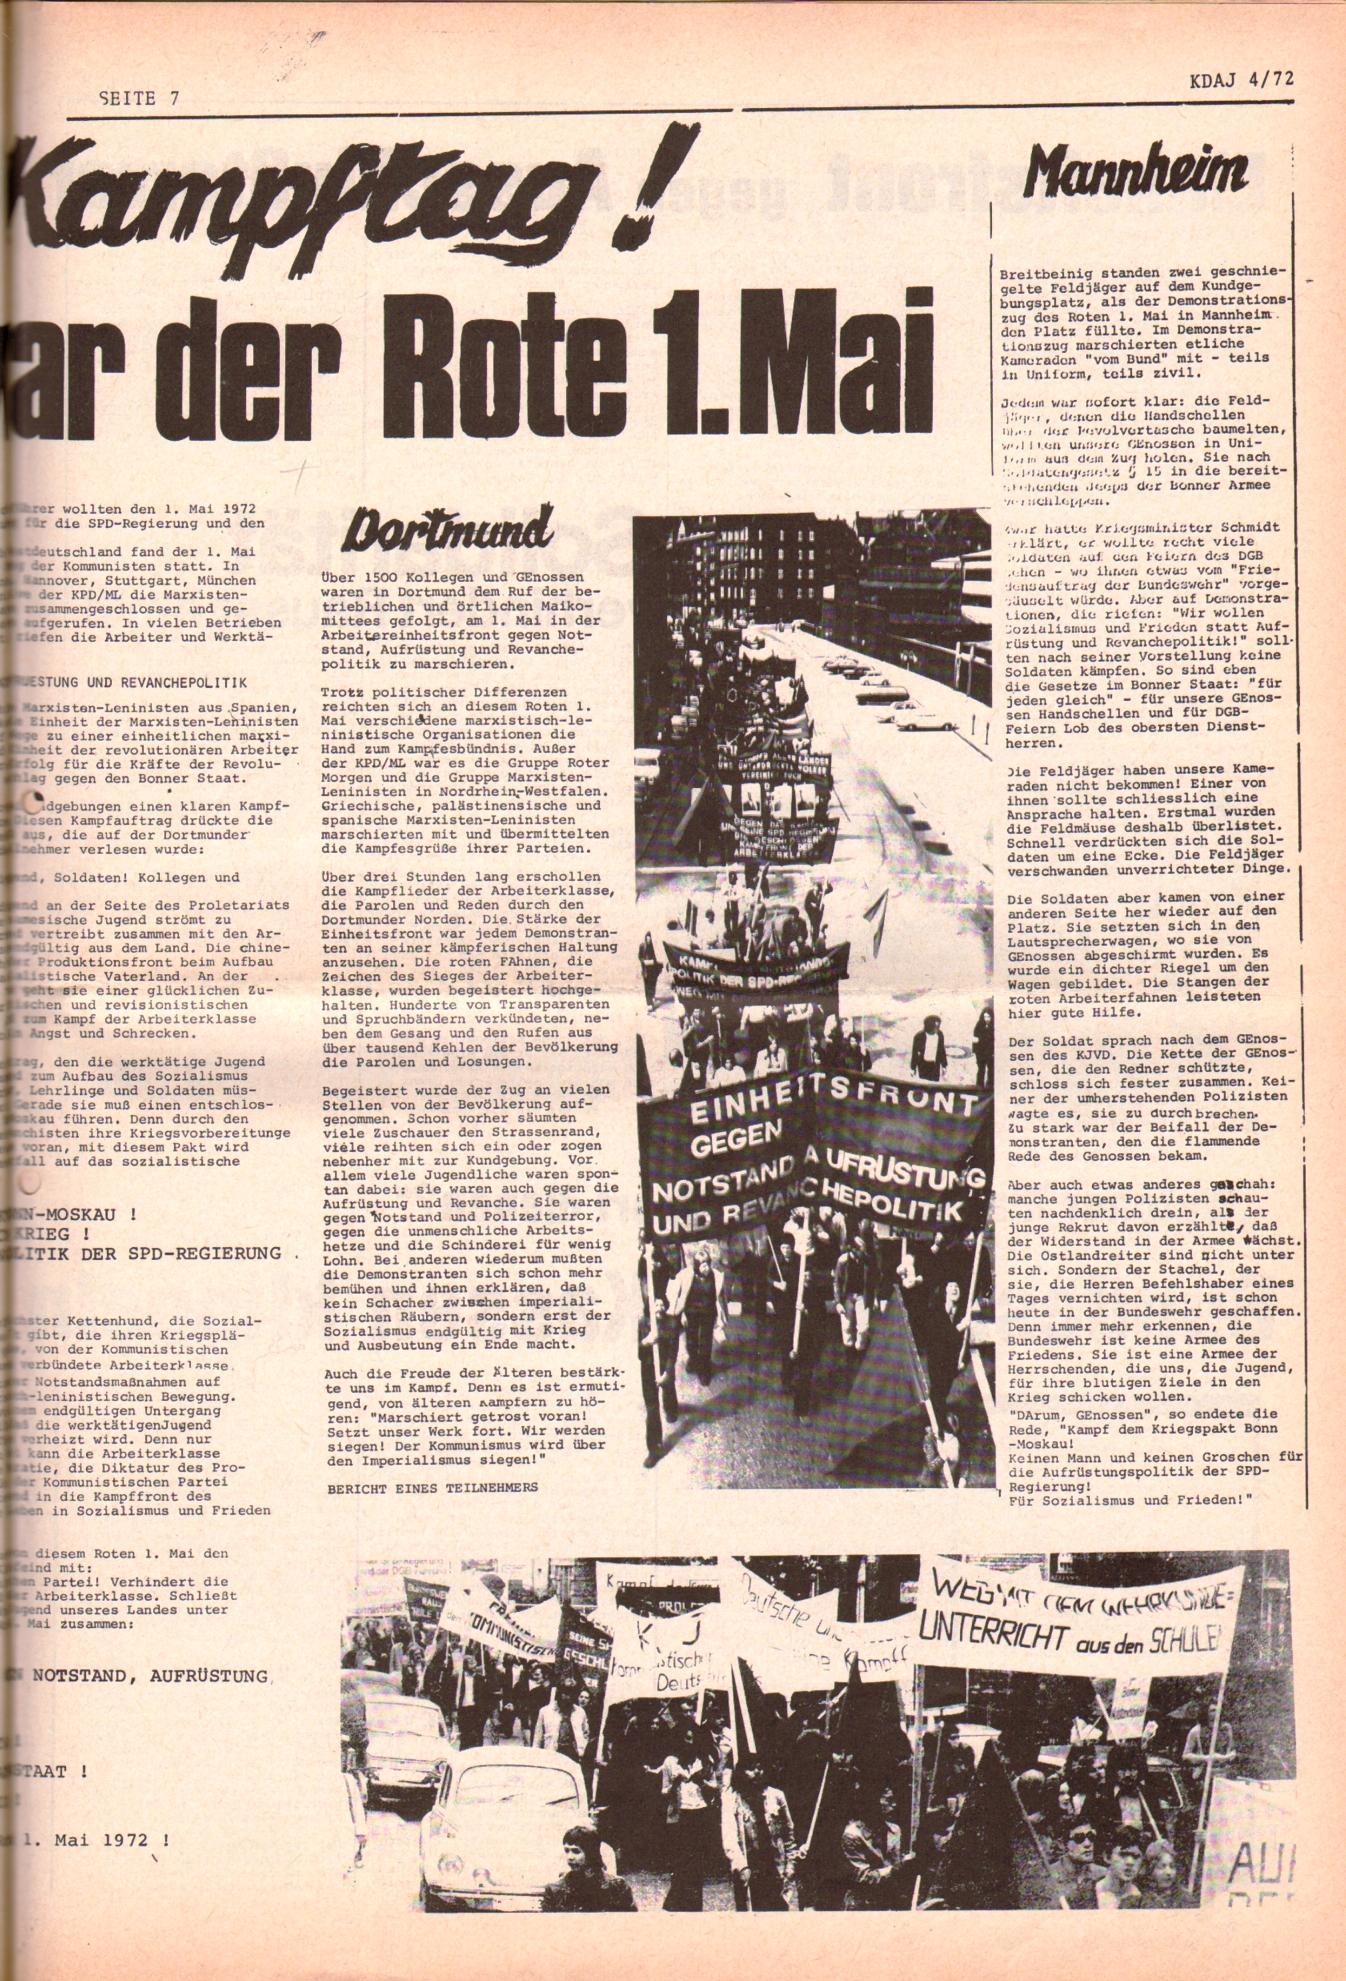 KDAJ, 3. Jg., Mai 1972, Nr. 4, Seite 7